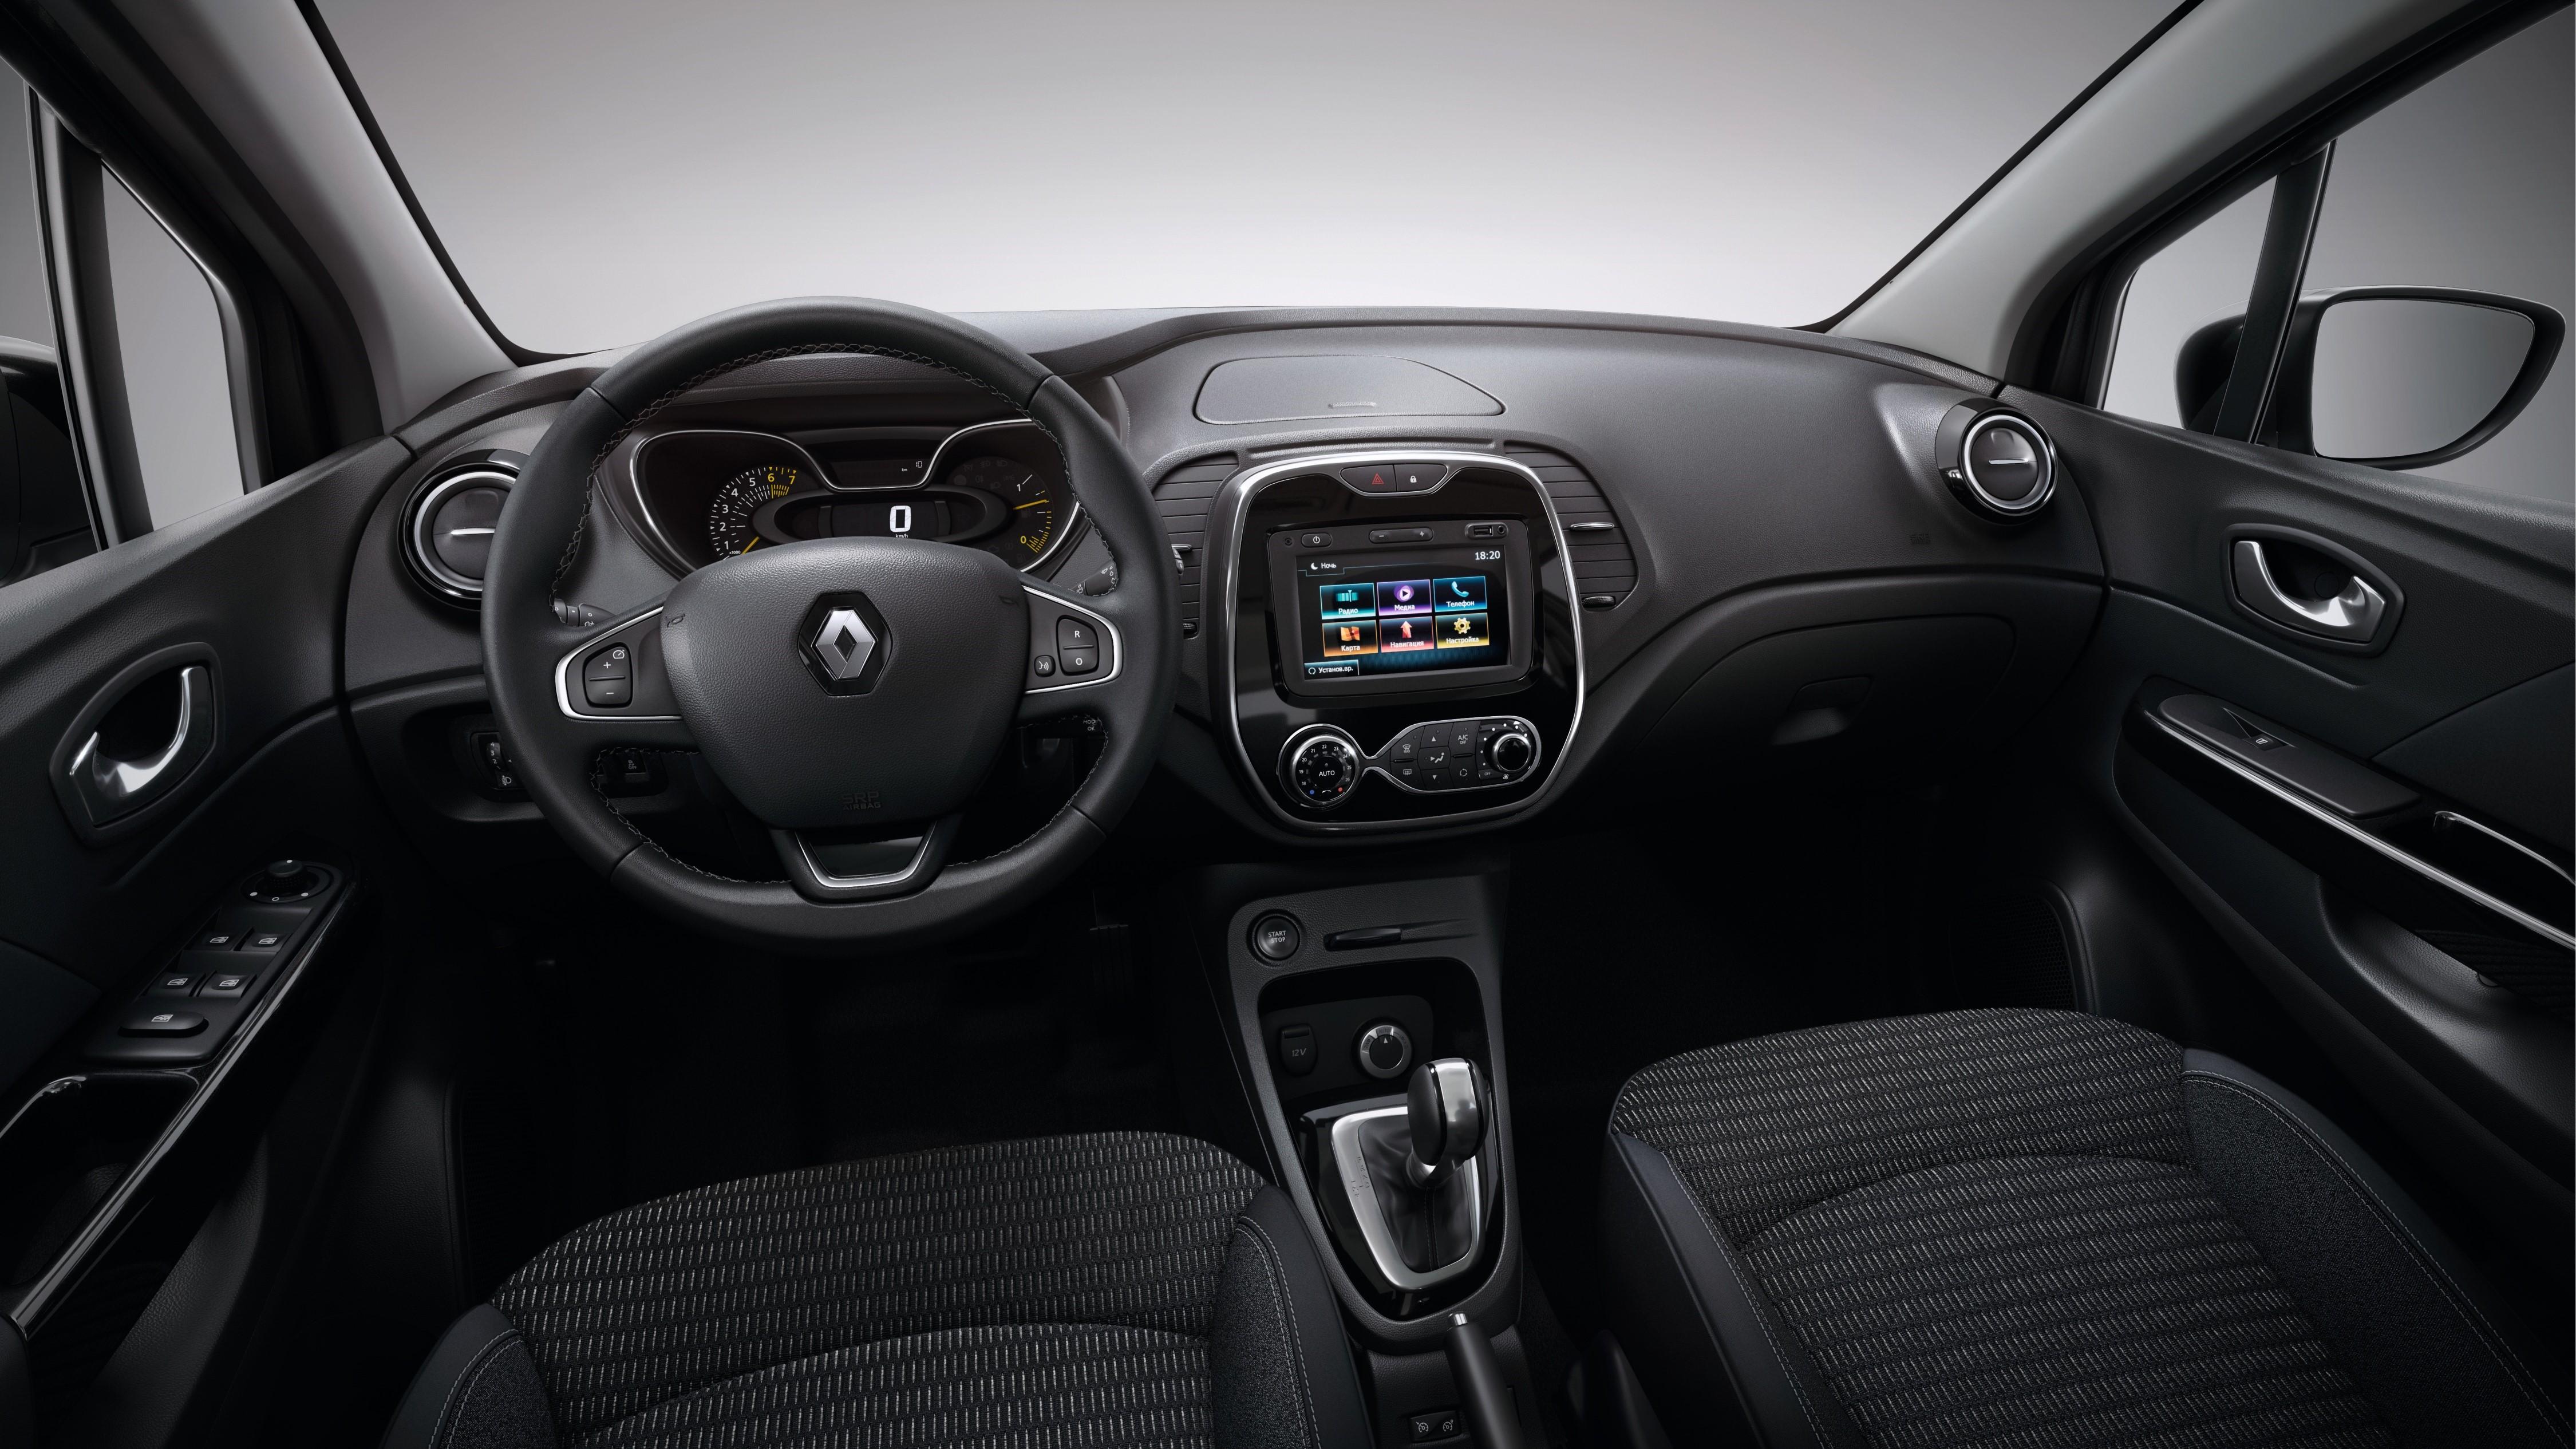 Renault Kaptur images (2)